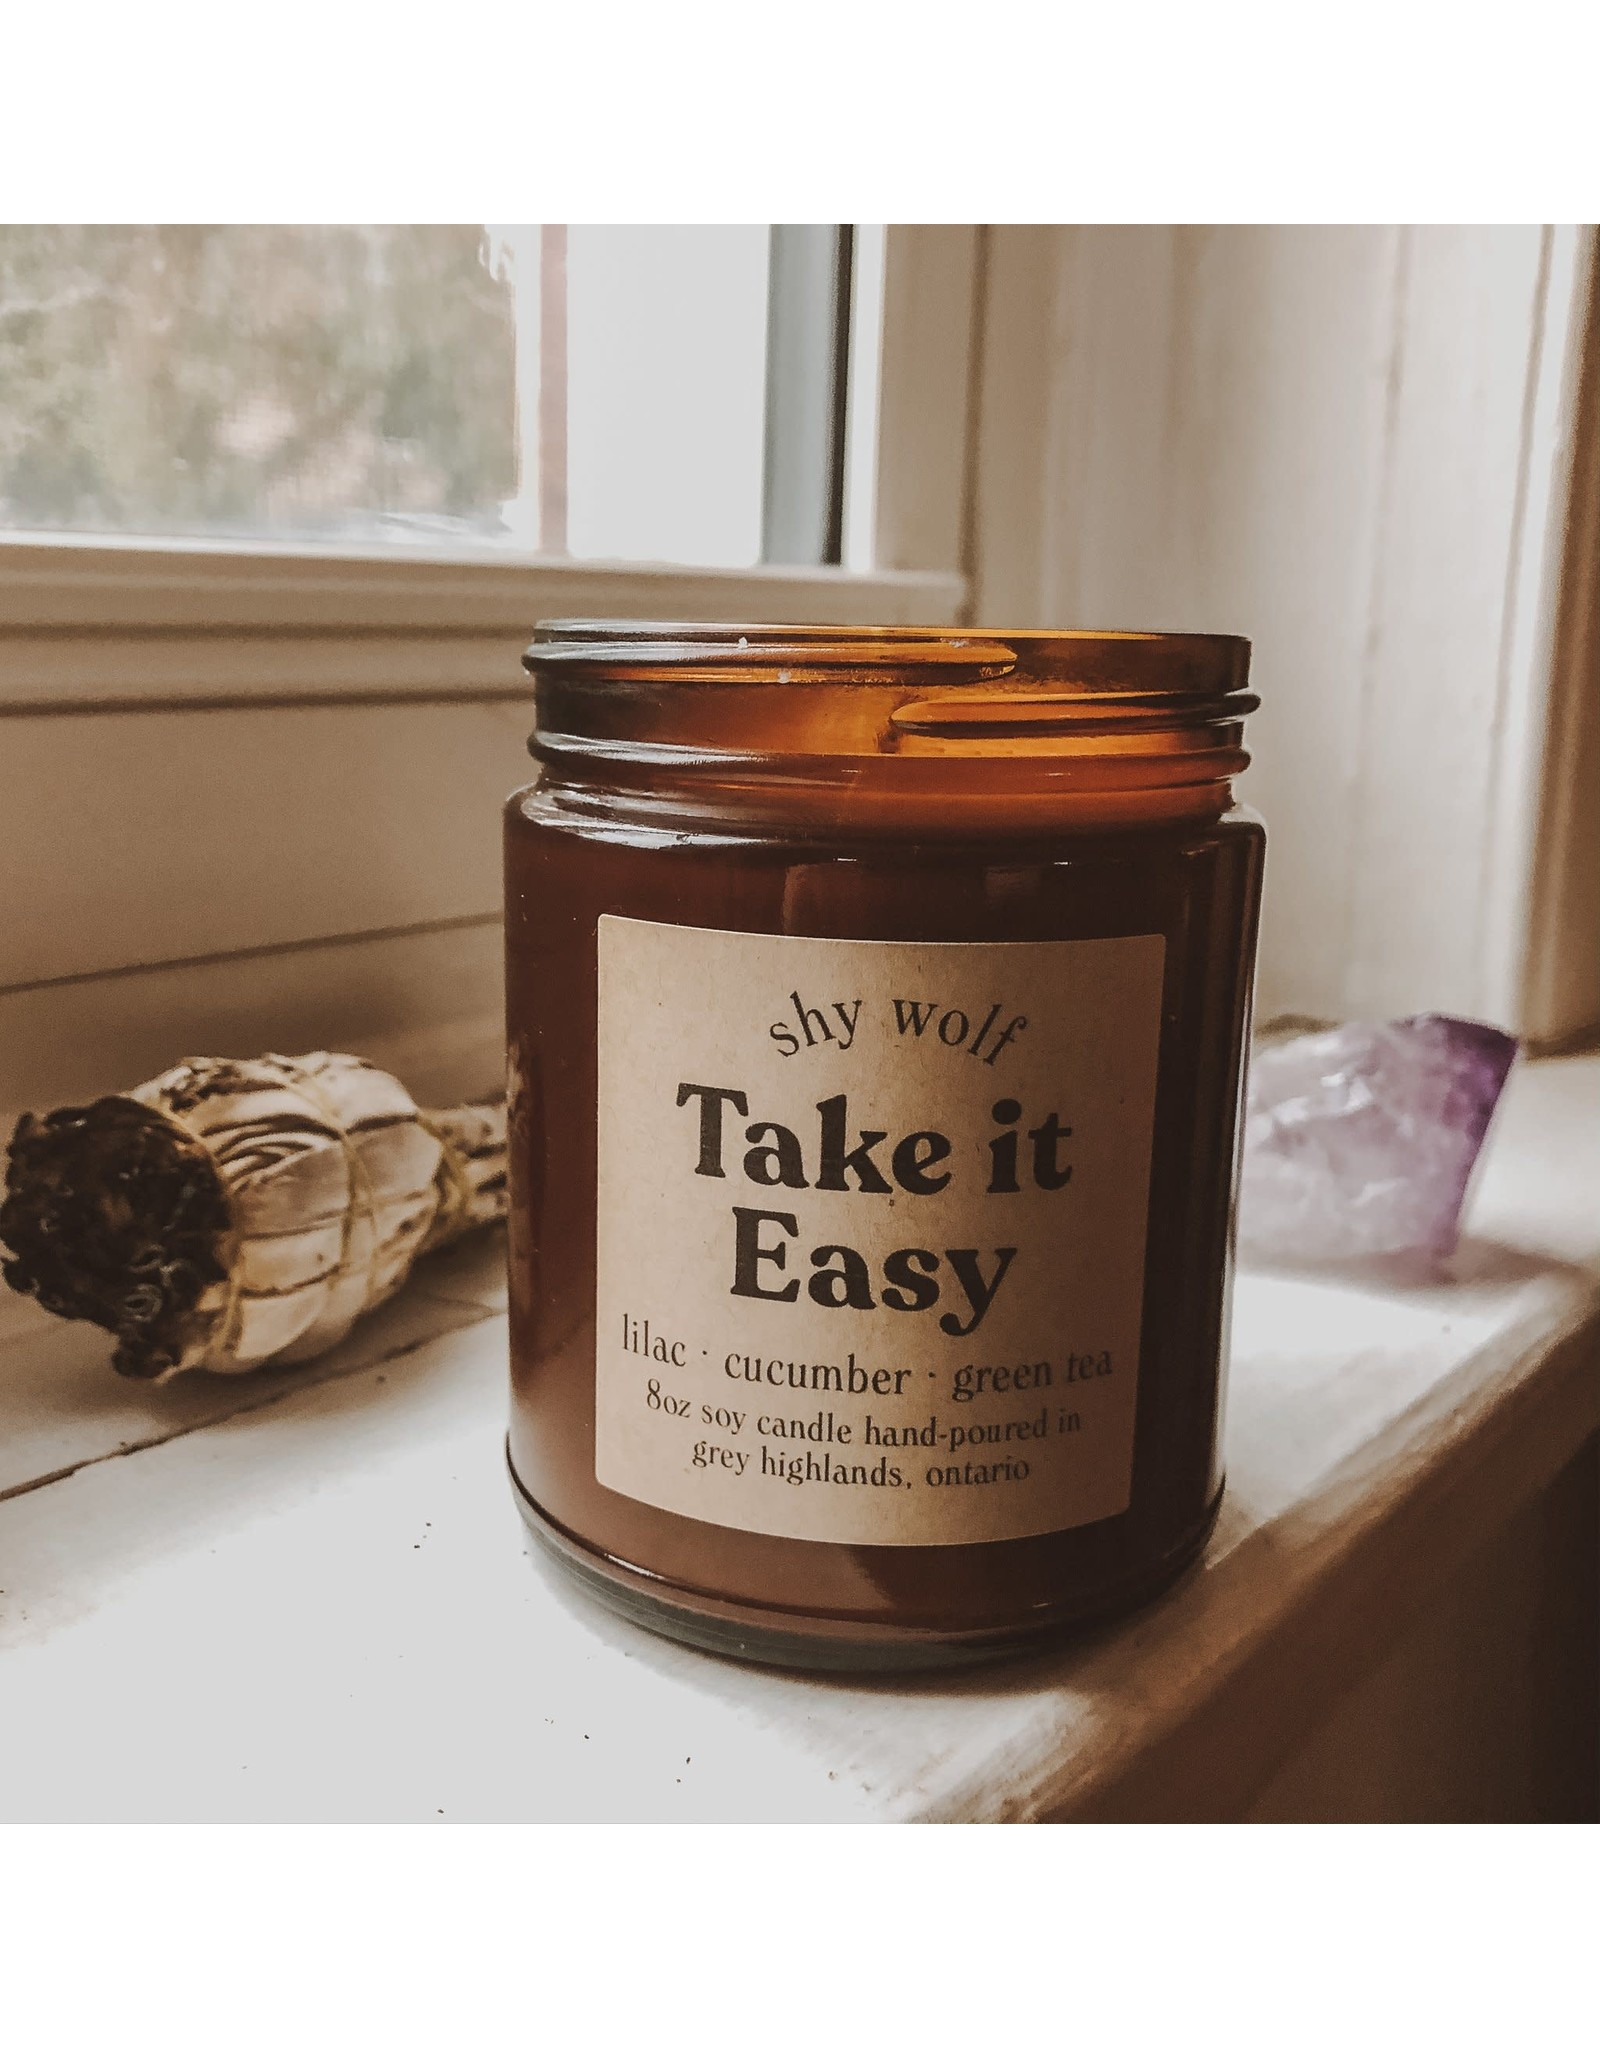 Shy Wolf - Take it Easy Candle 8 oz